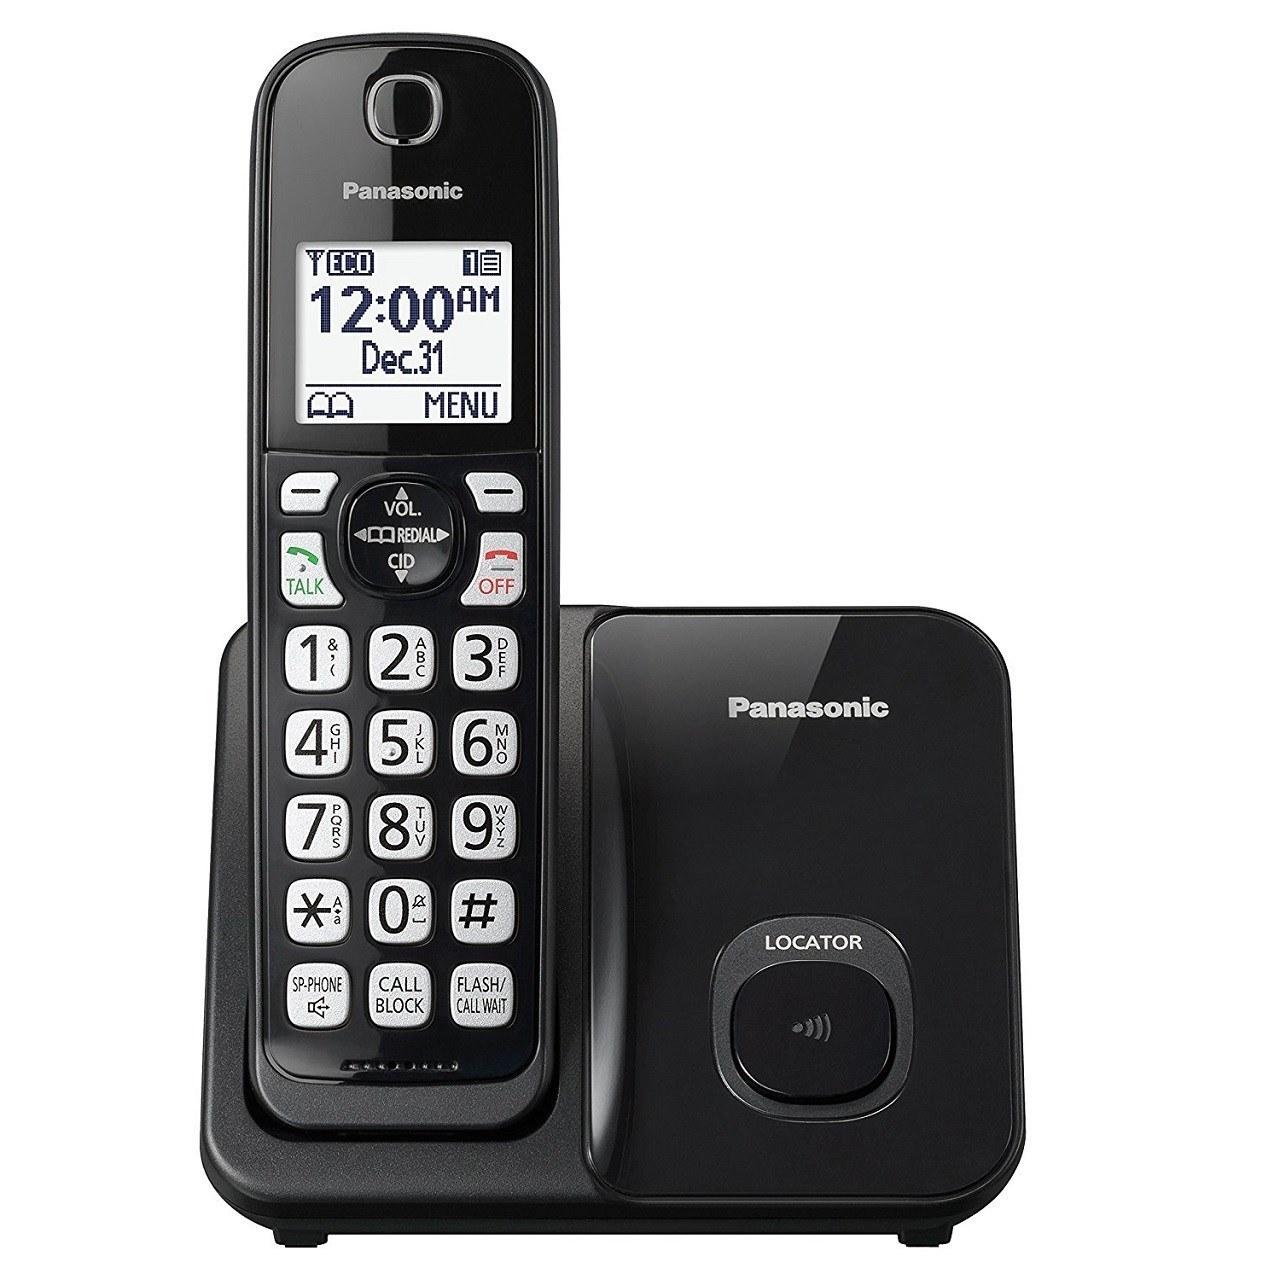 تصویر گوشی تلفن  بی سیم  پاناسونیک ا Panasonic Cordless Telephone KX-TGD510 Panasonic Cordless Telephone KX-TGD510